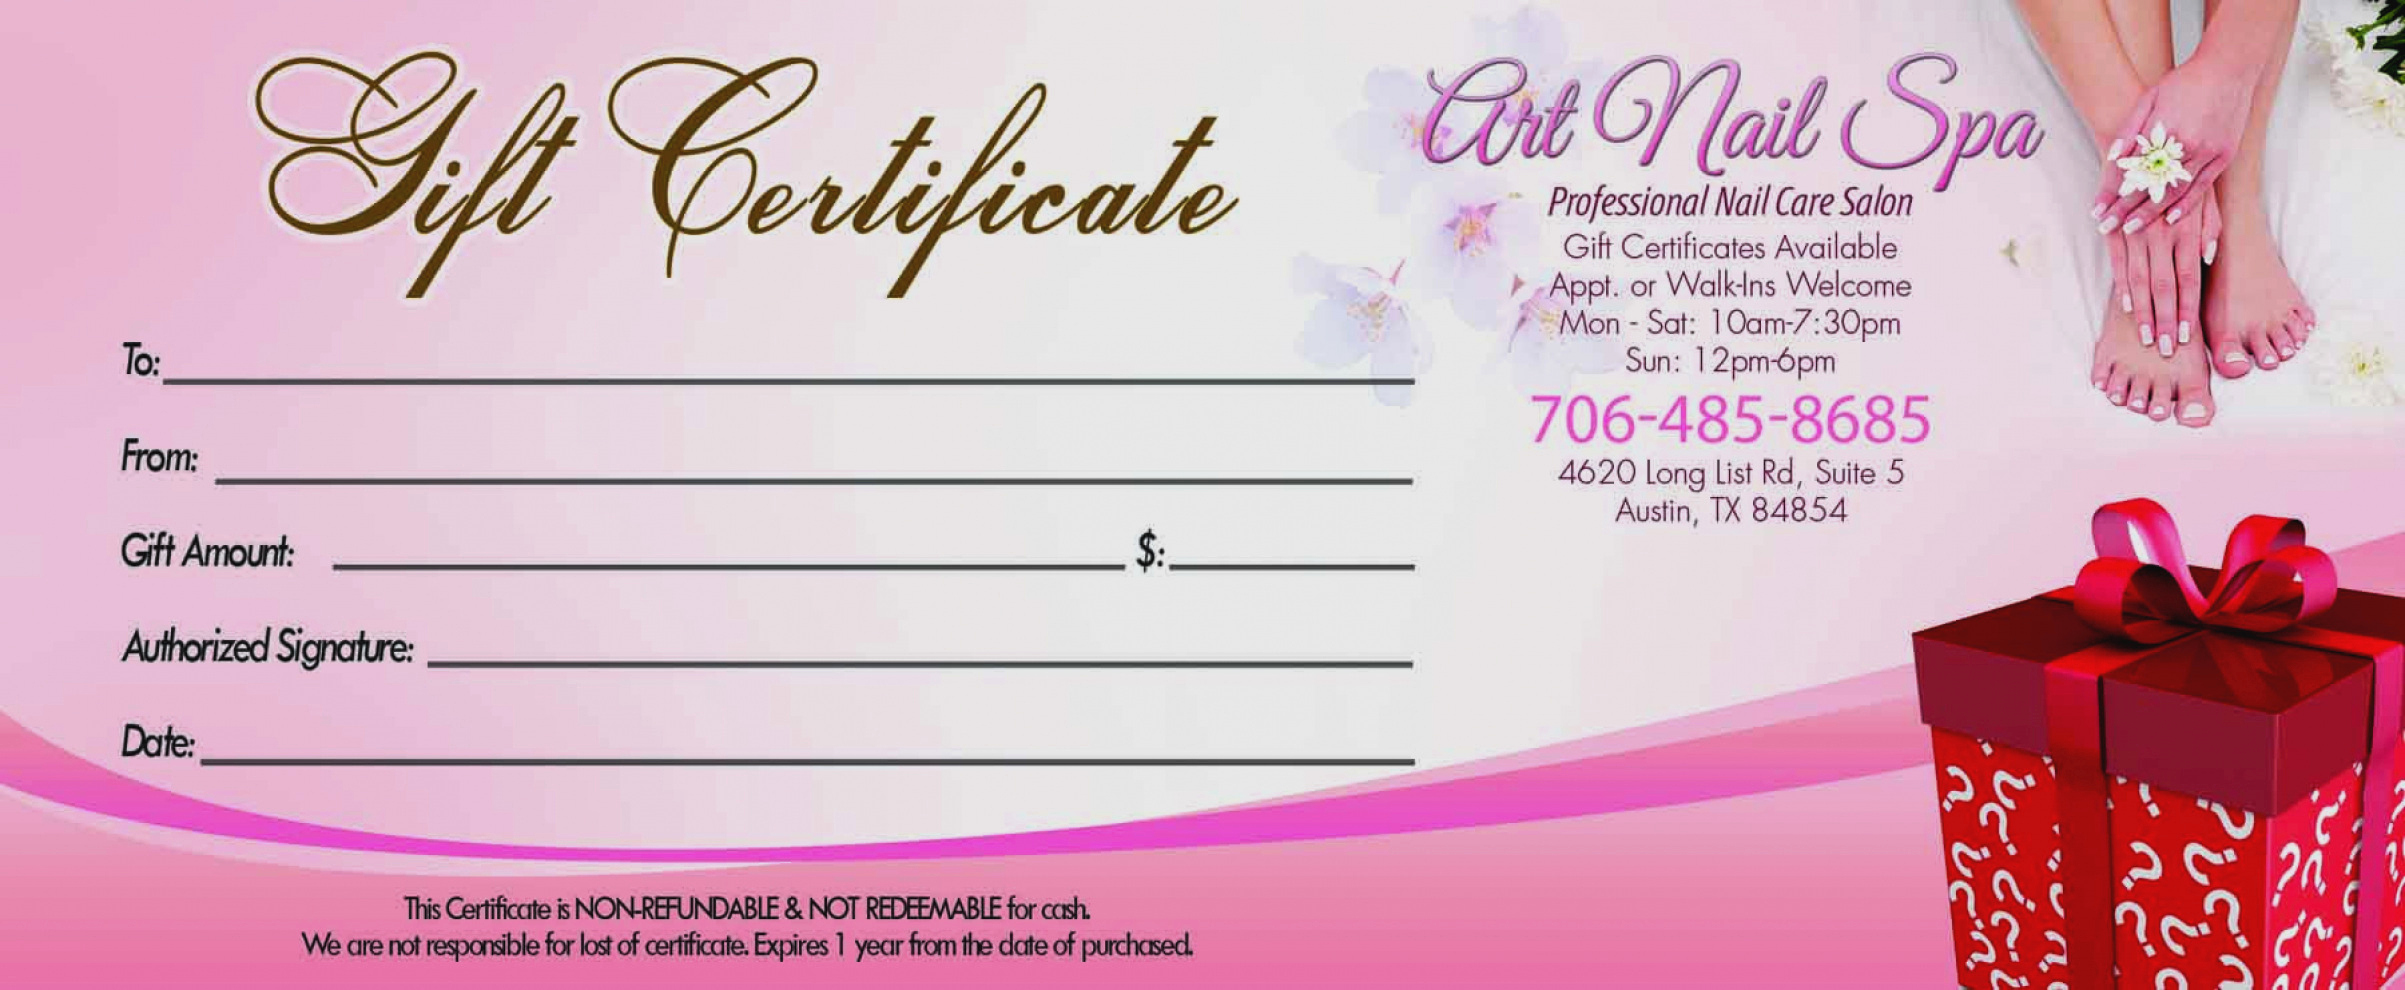 Spa Gift Certificate Template Free Beautiful Gift Certificate Template Nails